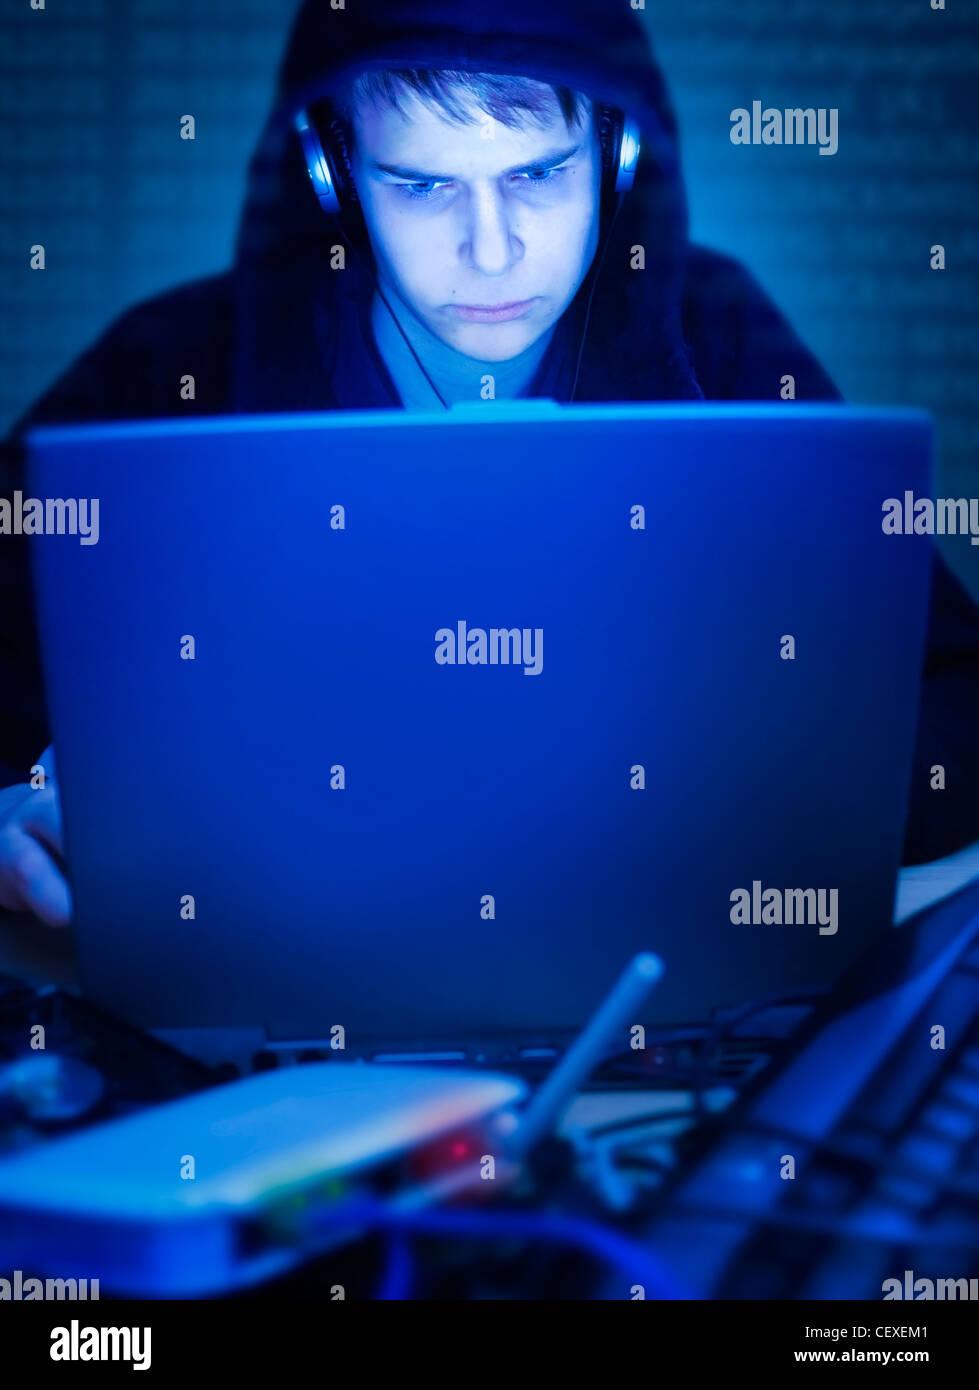 The hacker - Stock Image